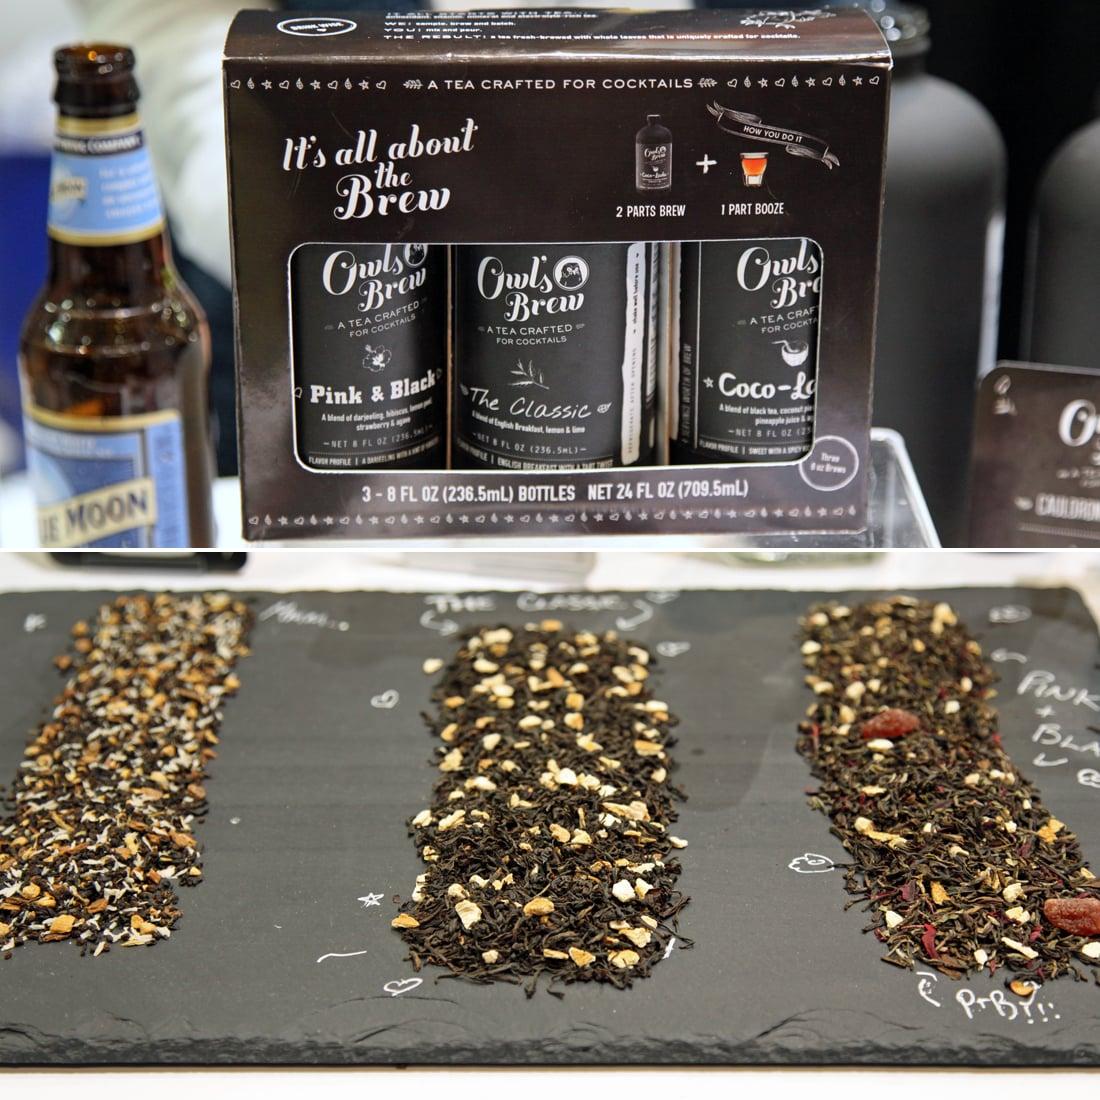 Best Cocktail Mixer (Runner-Up): Owl's Brew Pink & Black